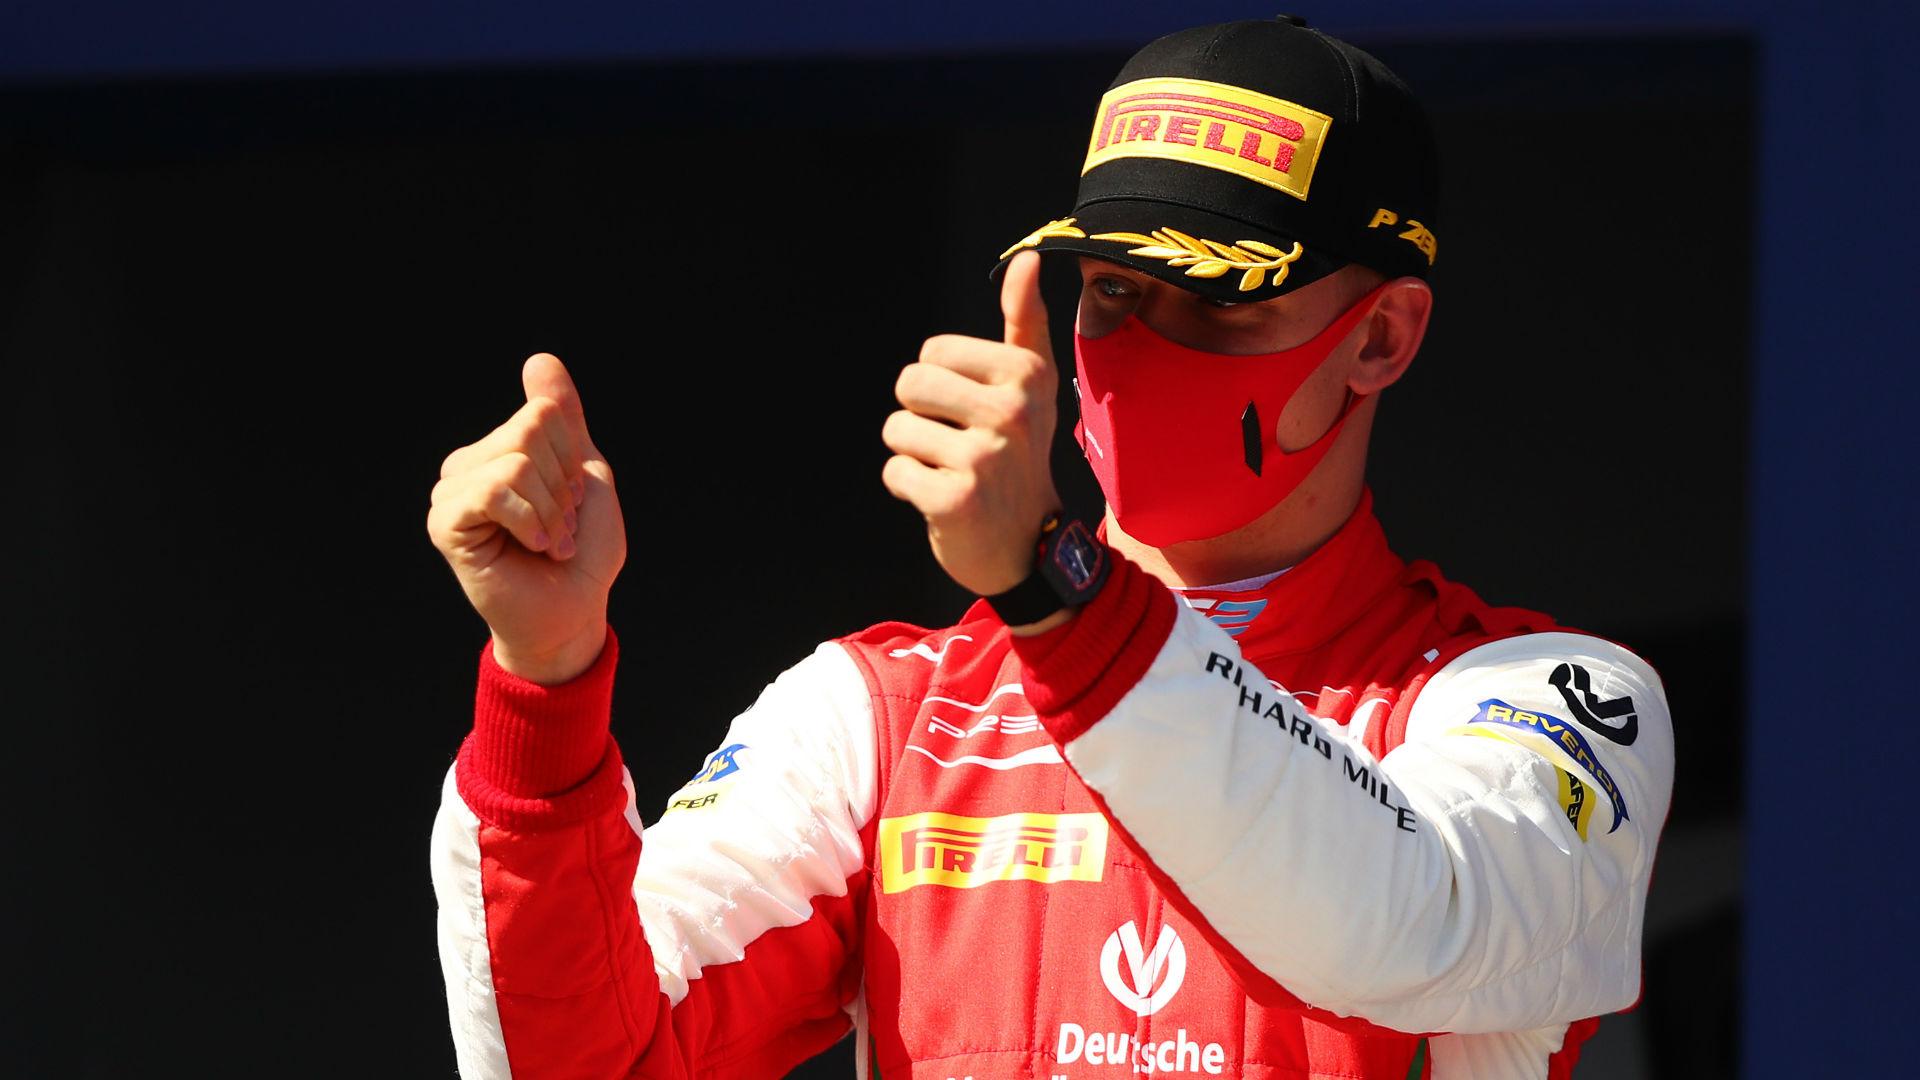 Mick Schumacher: The Ferrari academy graduates who made it to F1